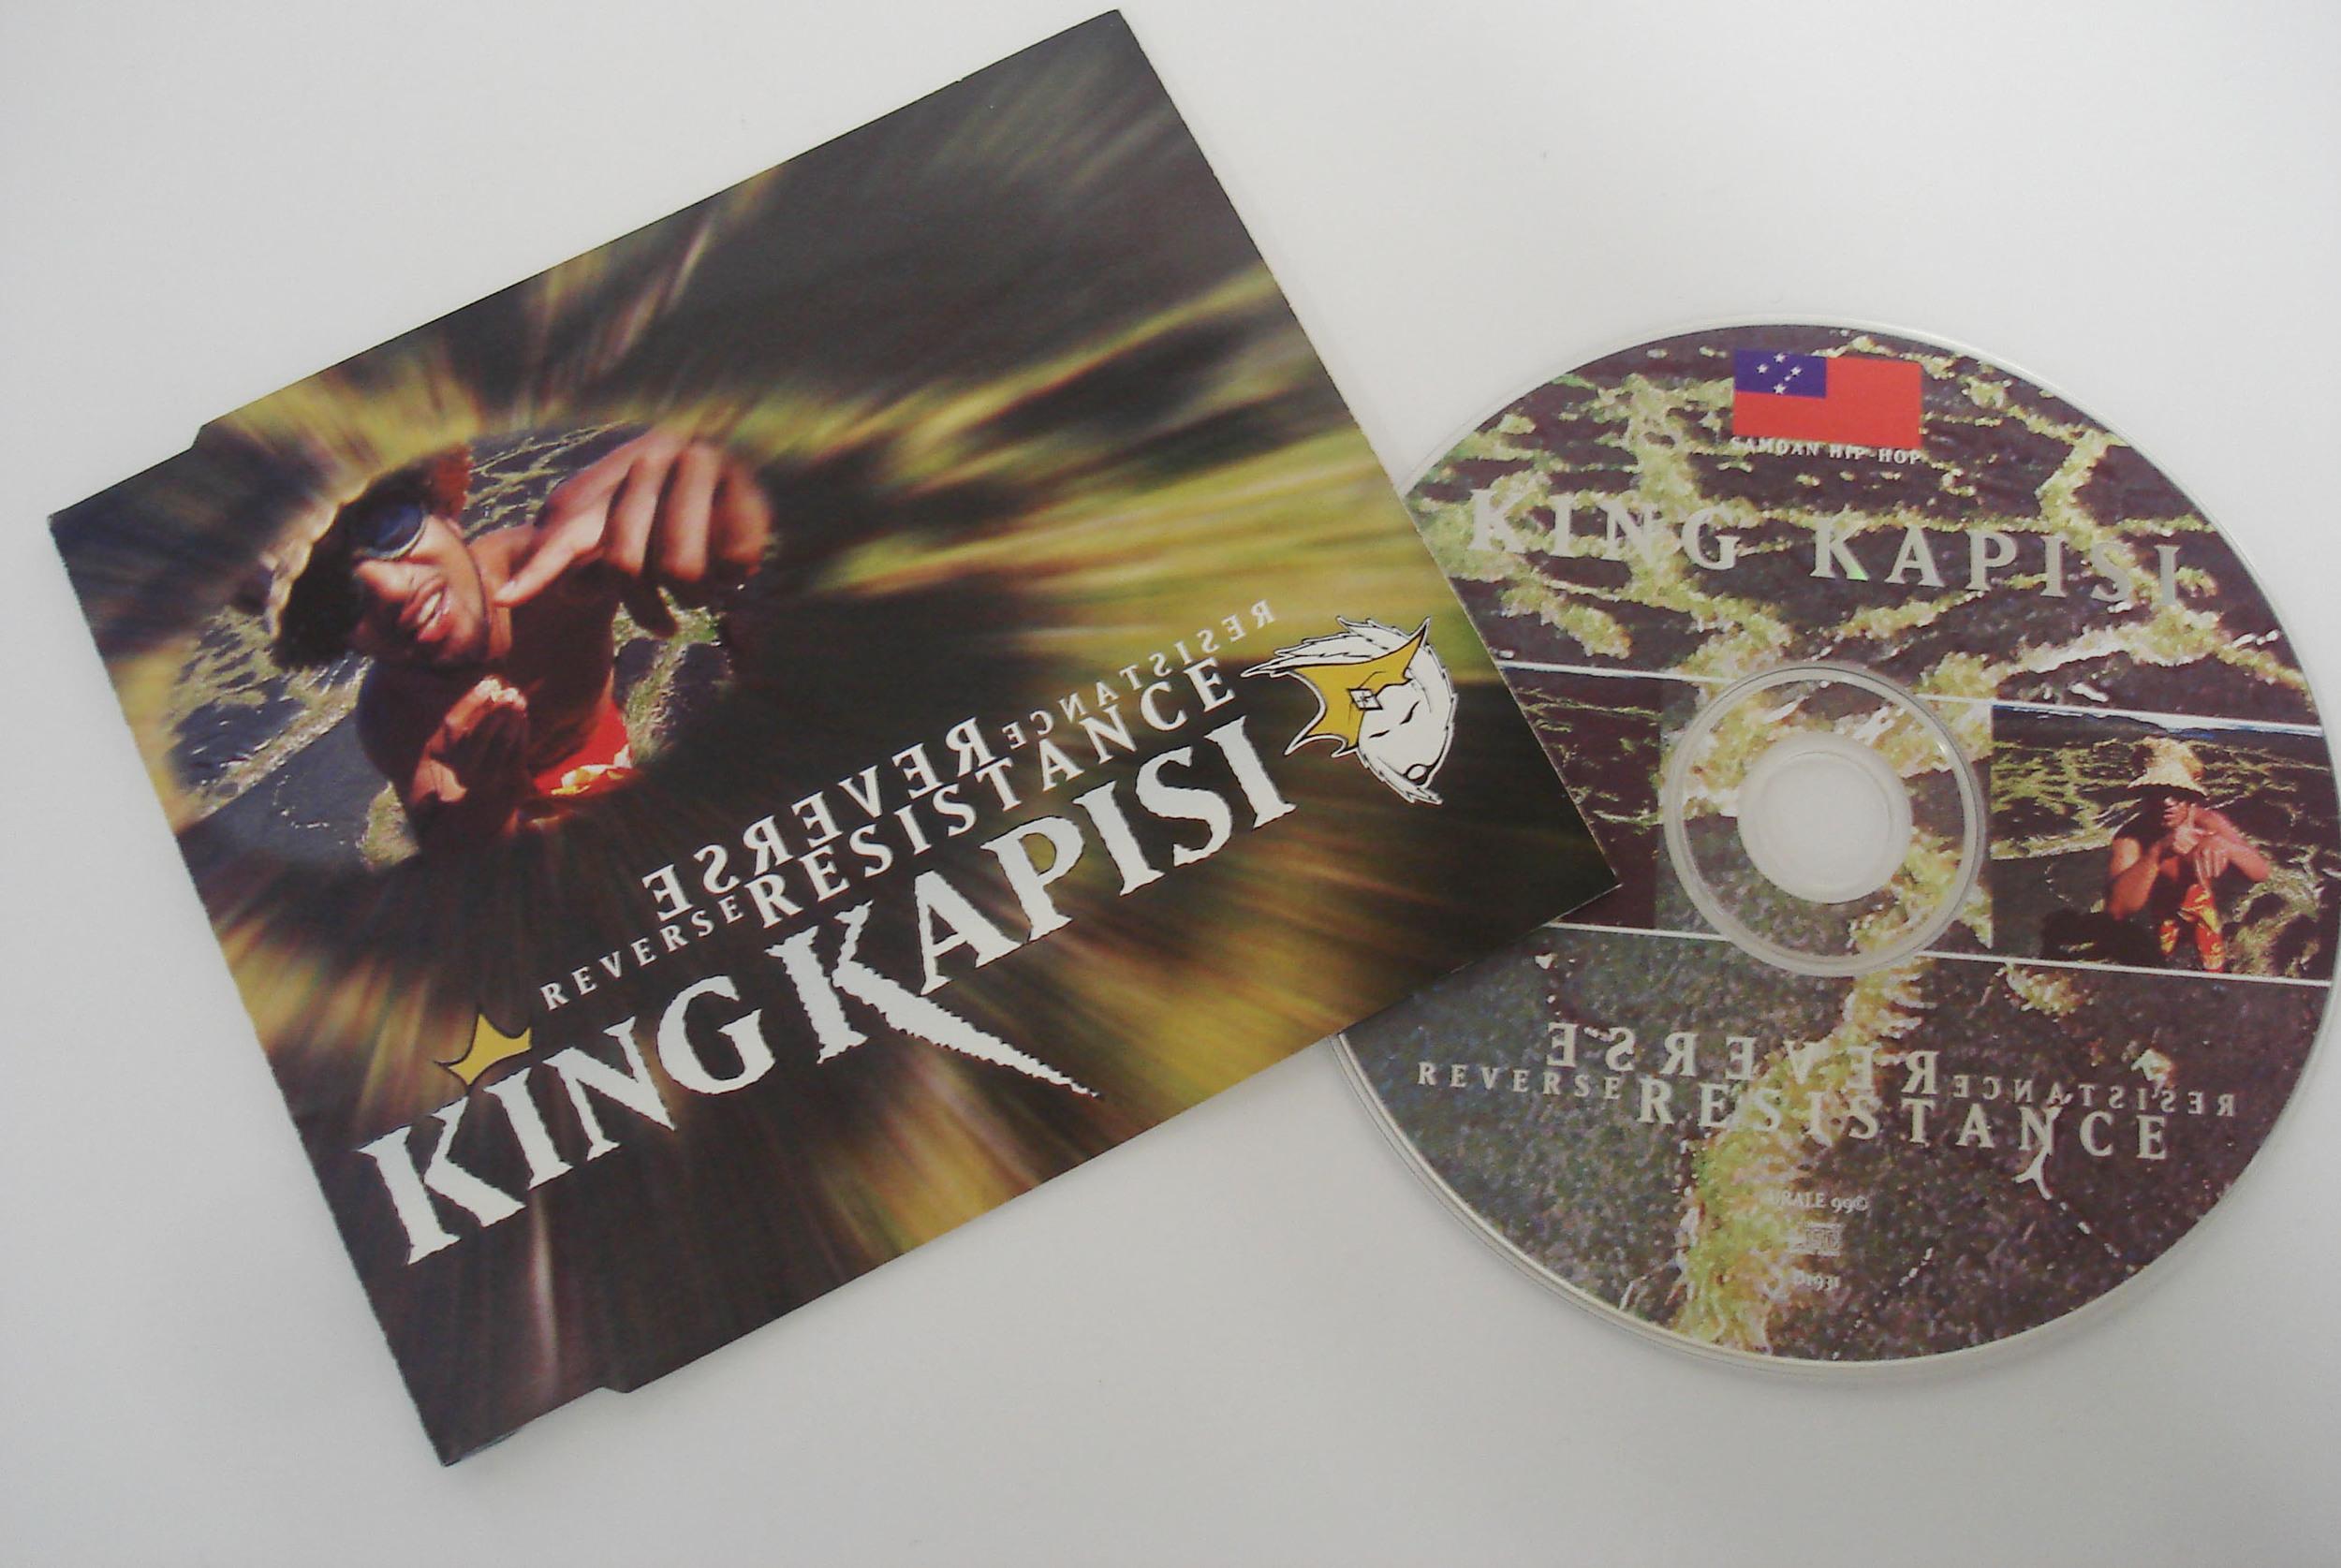 KING KAPISI - REVERSE RESISTANCE - SINGLE